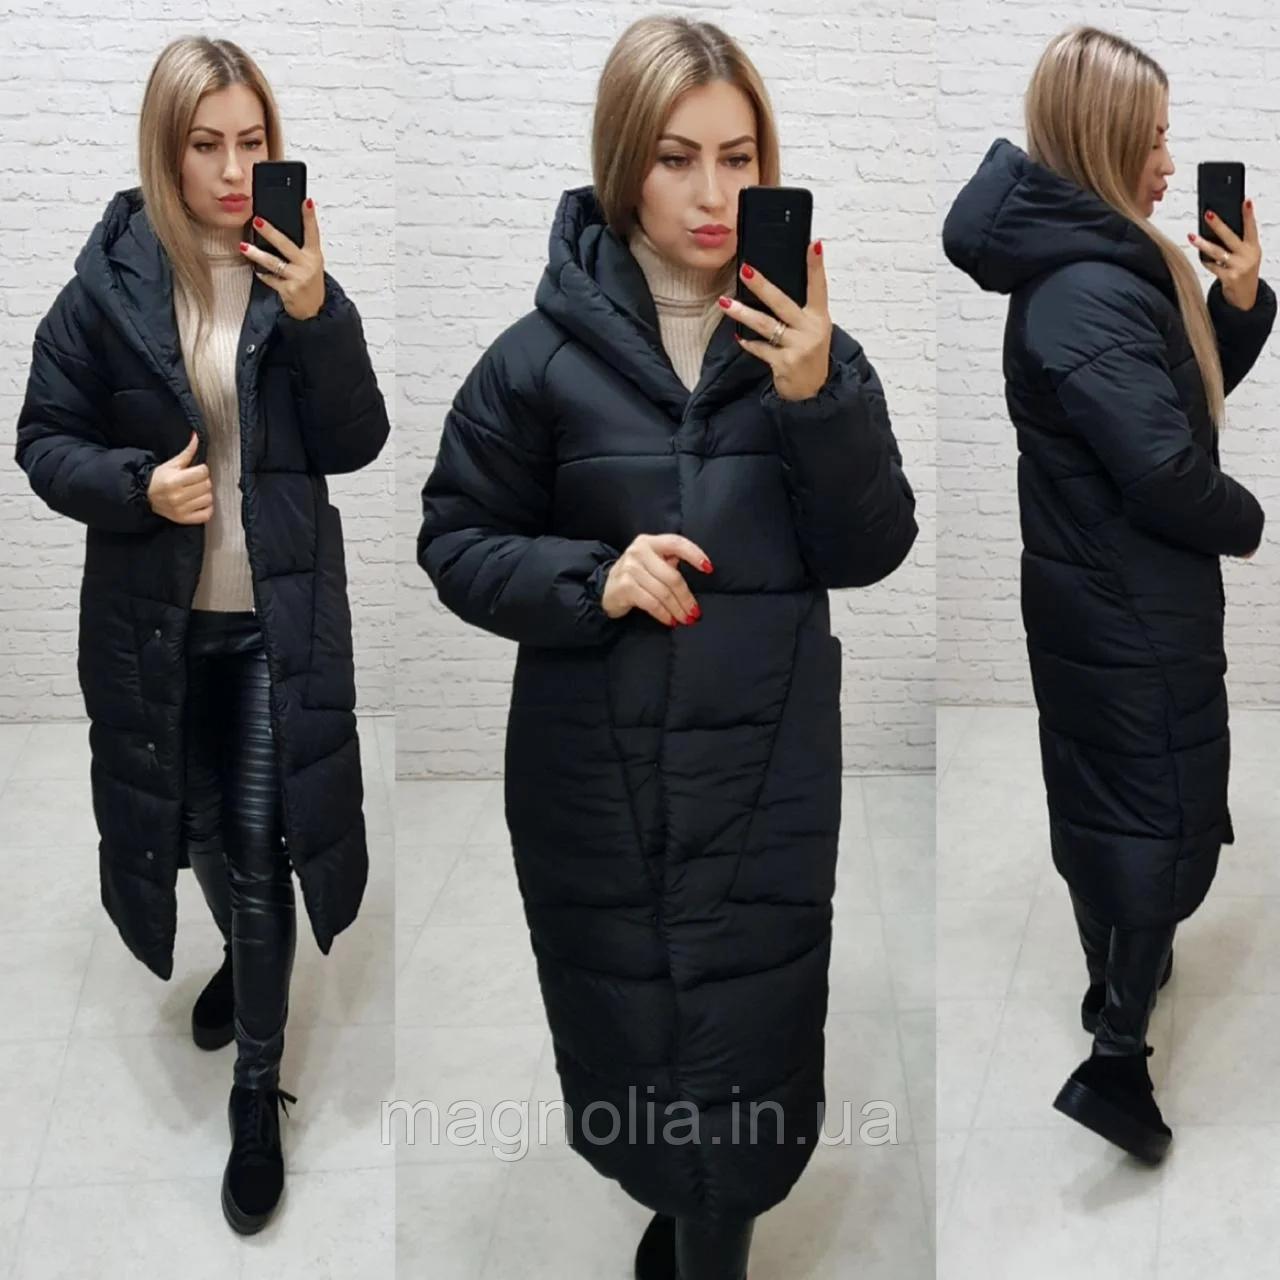 Длинная теплая зимняя куртка пальто пуховик оверсайз кокон одеяло плащевка + силикон